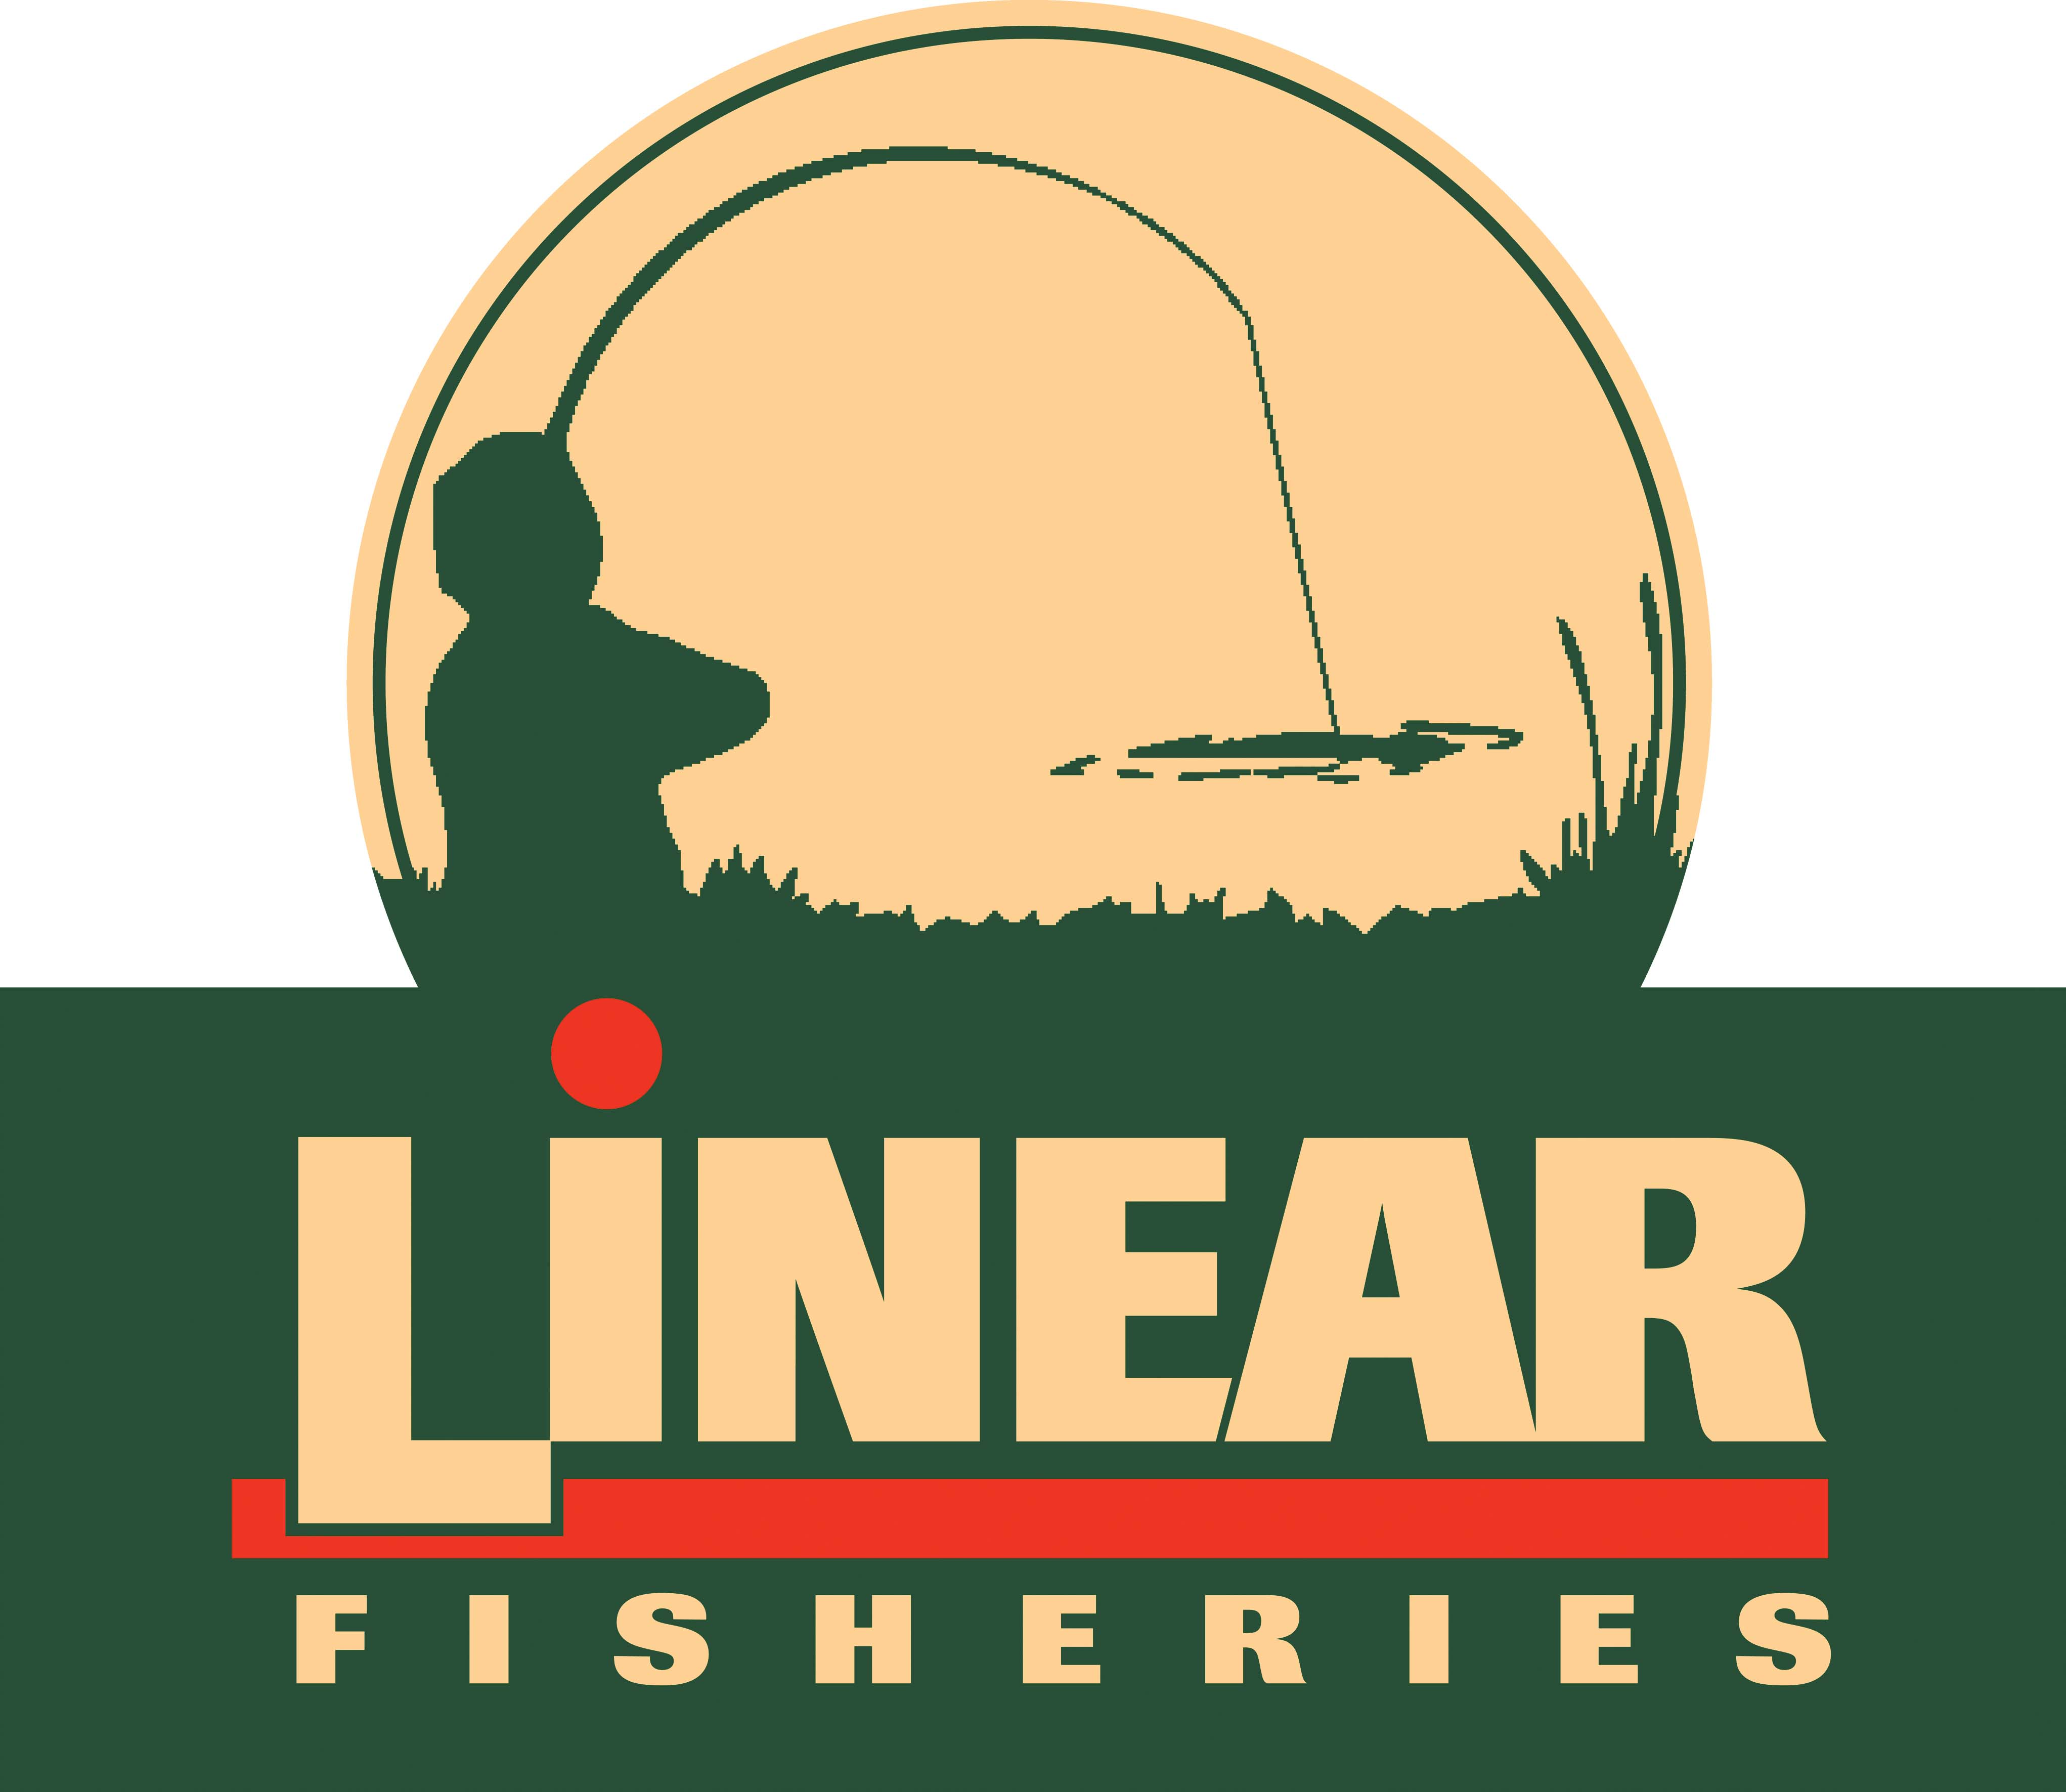 Linear Fisheries